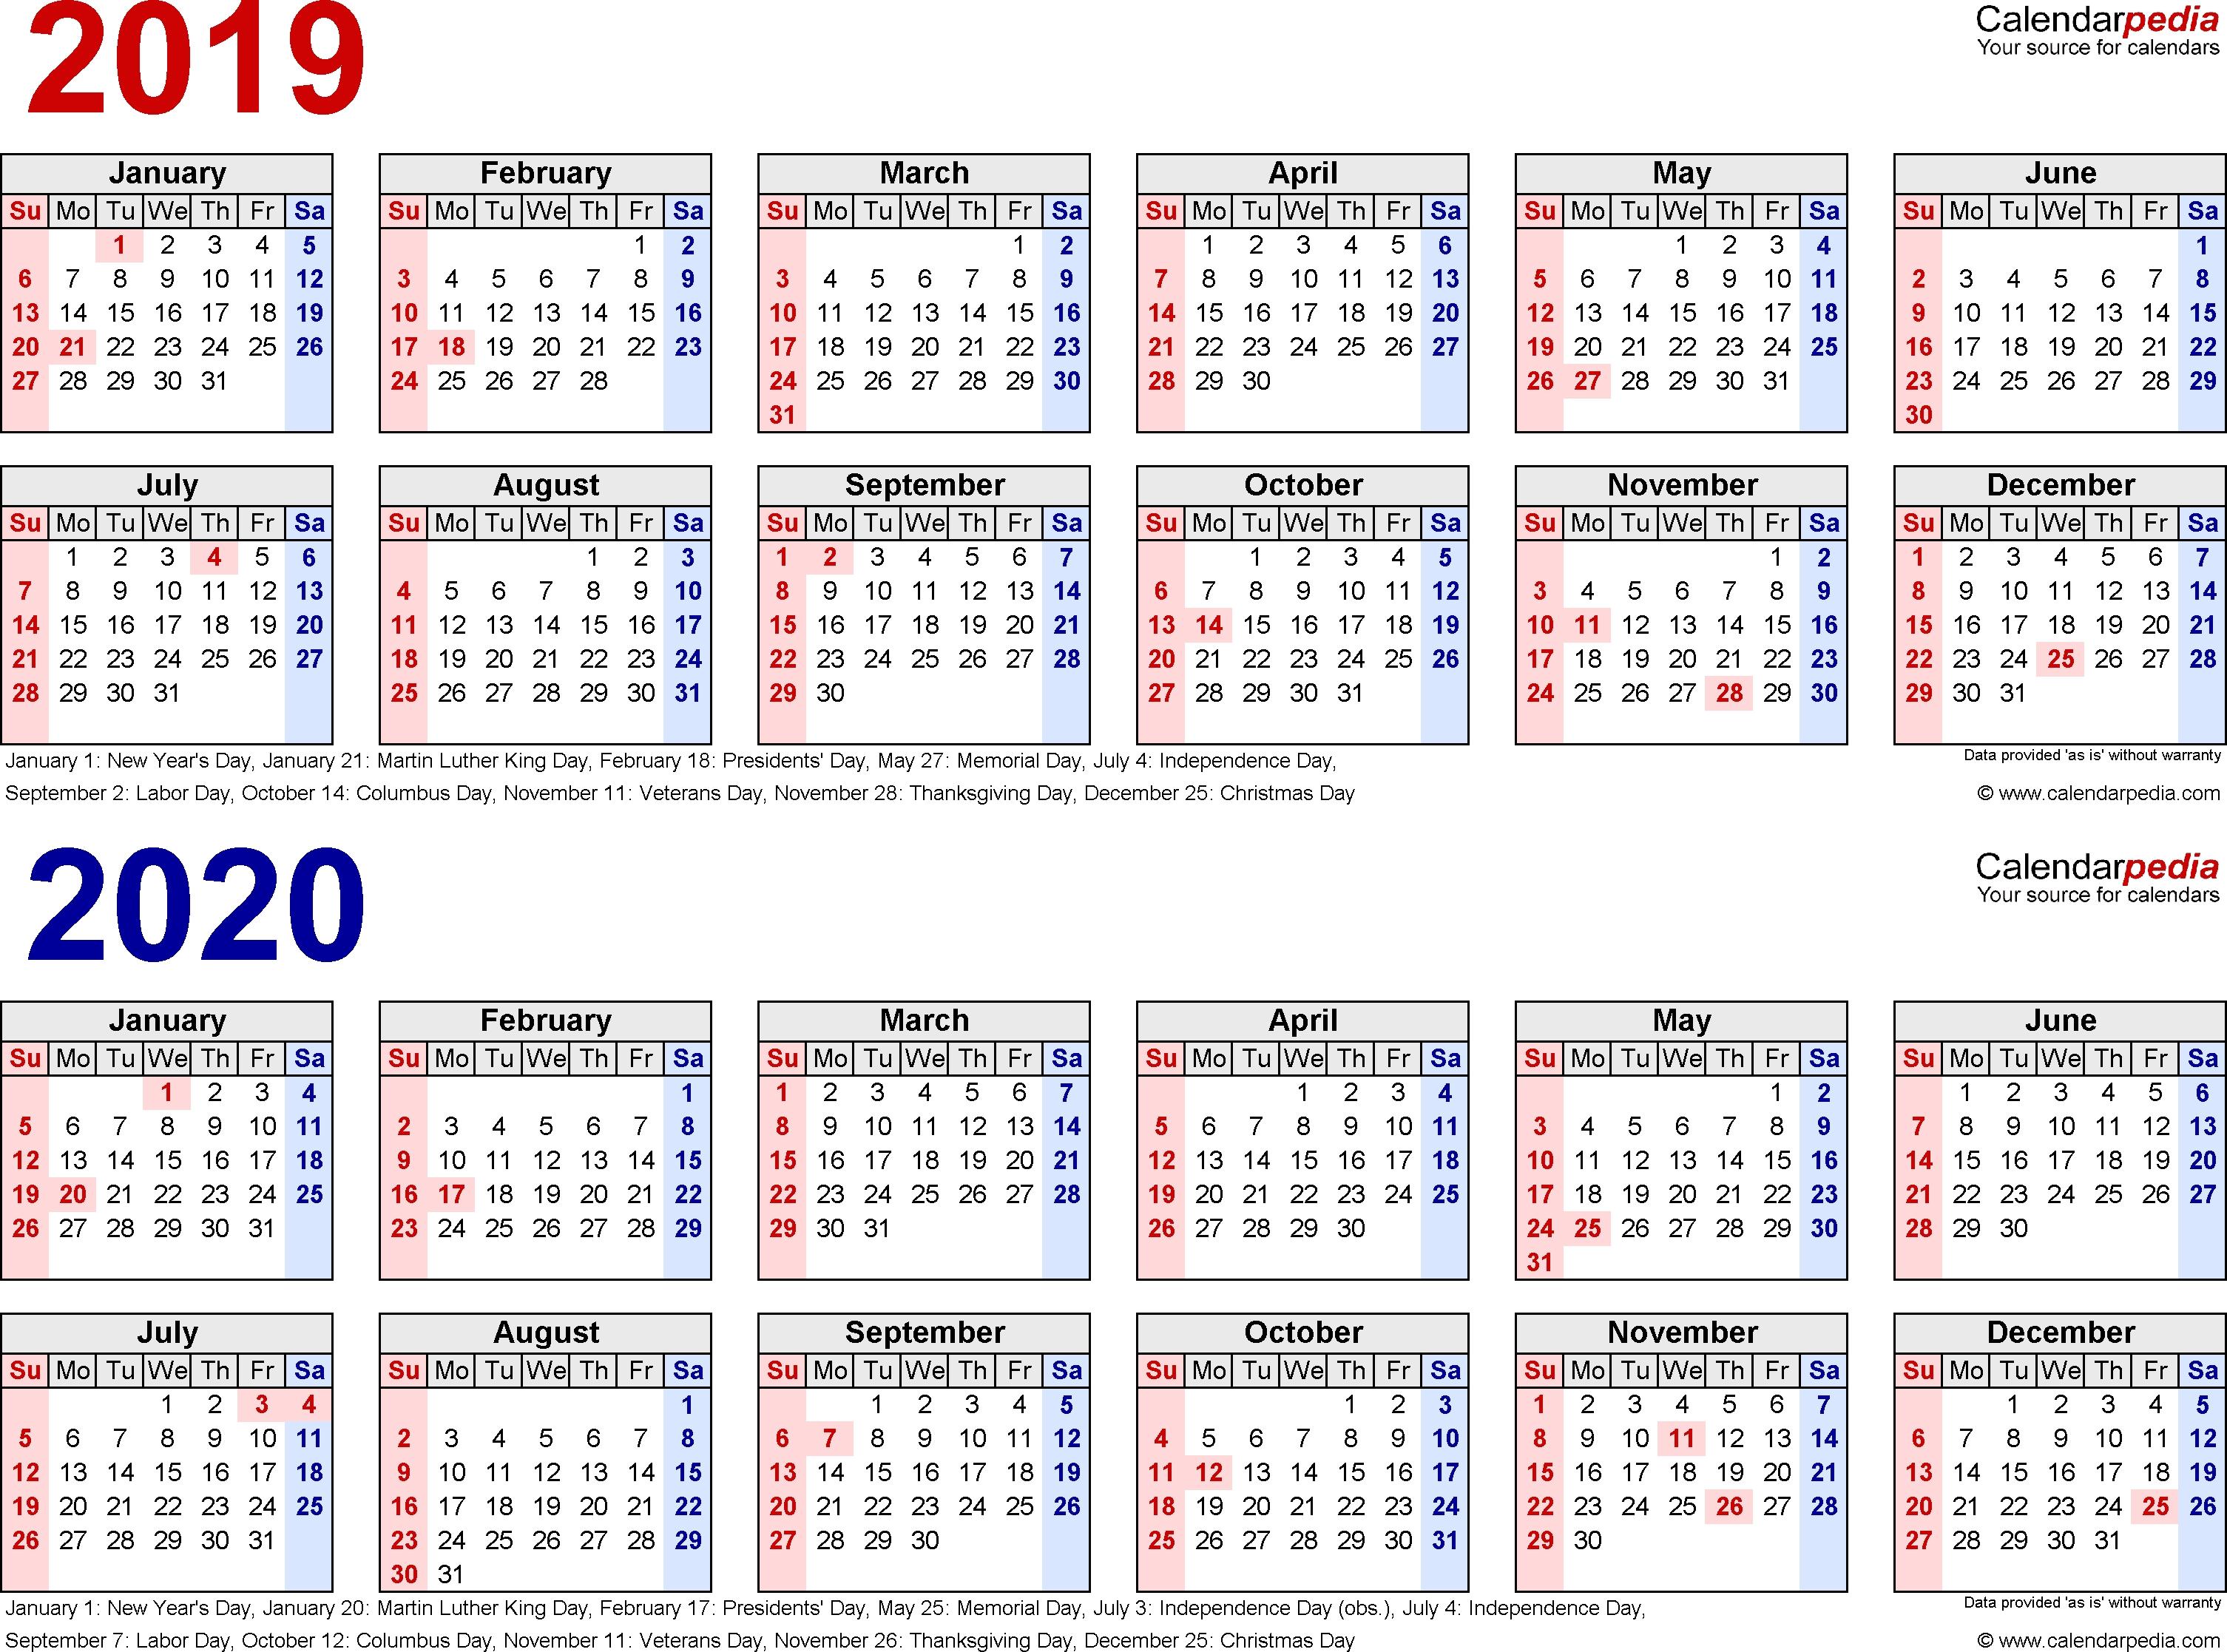 2019-2020 Calendar - Free Printable Two-Year Word Calendars regarding 2020 Calendars To Fill In